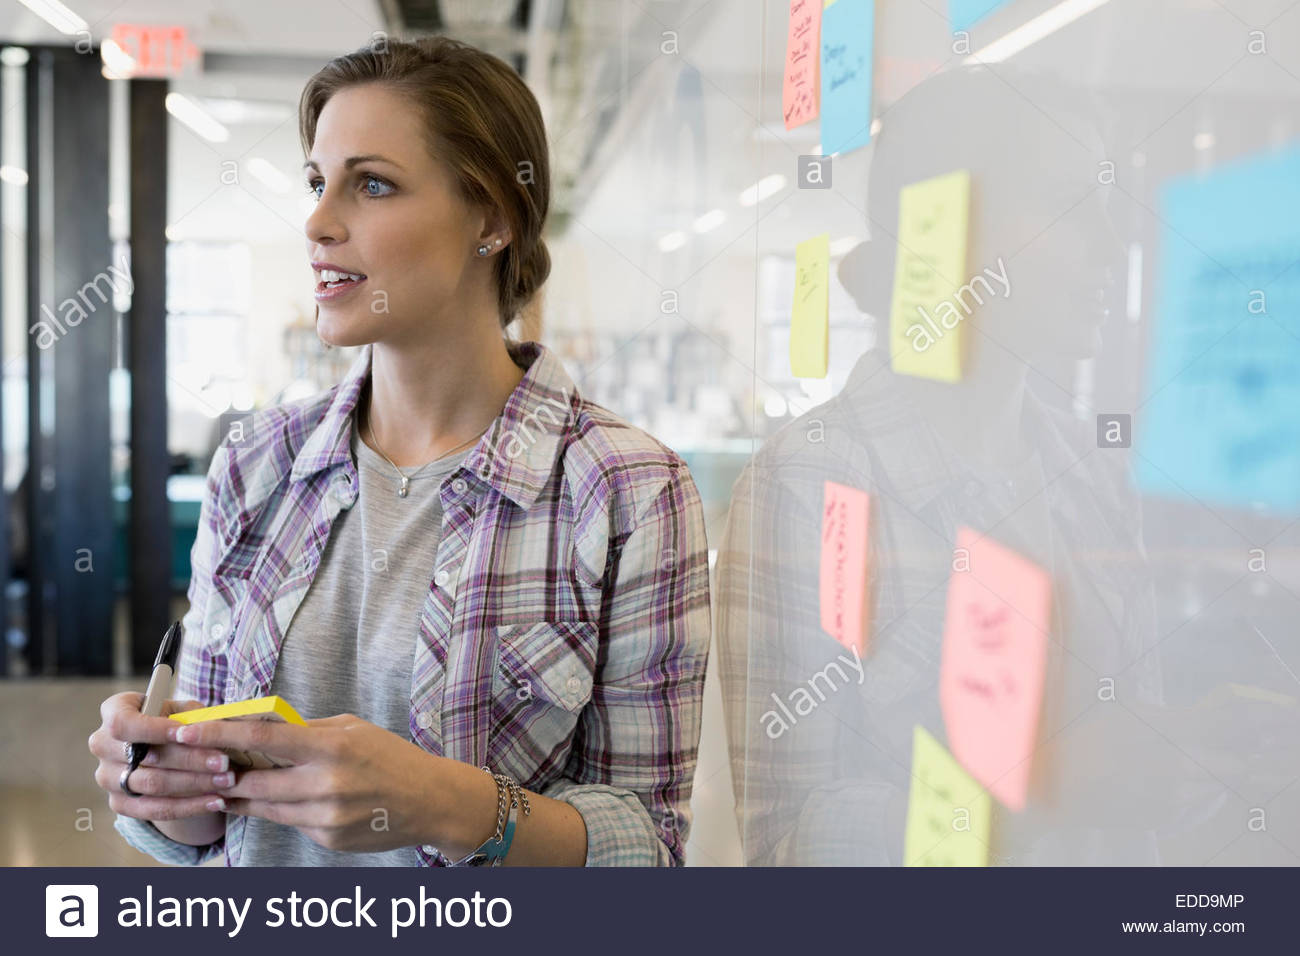 Businesswoman writing adhesive notes on whiteboard - Stock Image